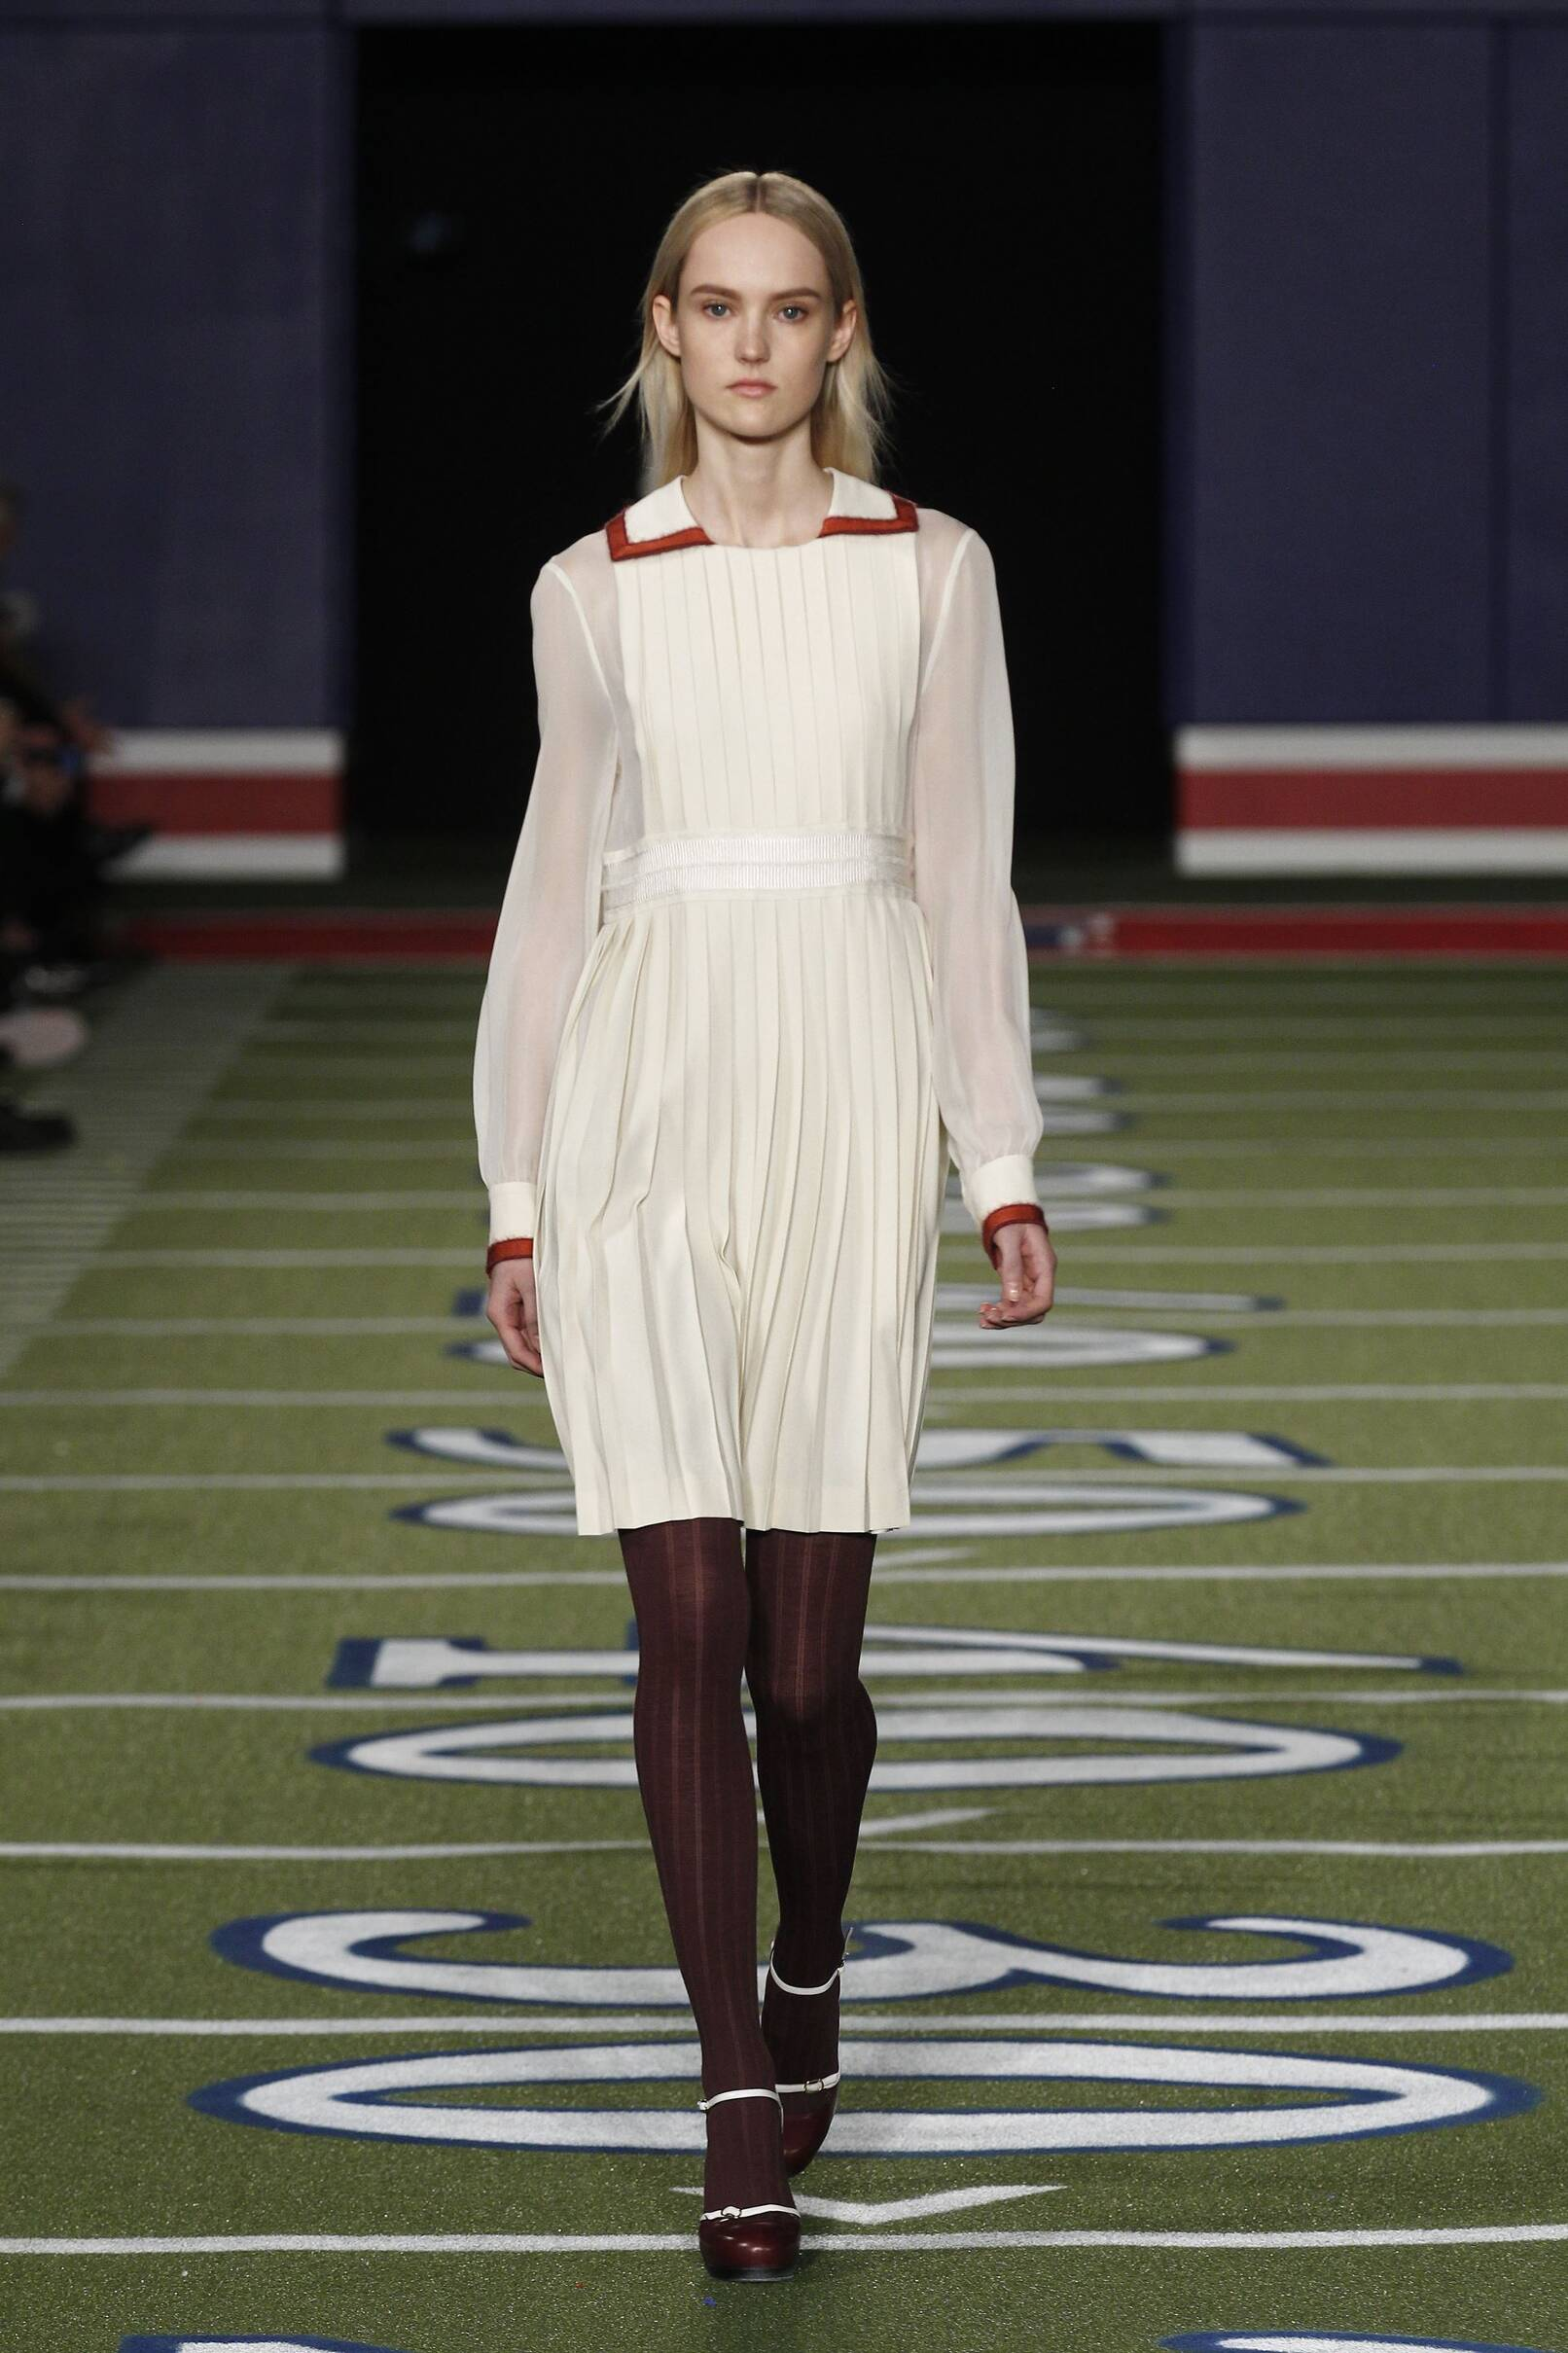 Fashion Model Tommy Hilfiger Collection Catwalk